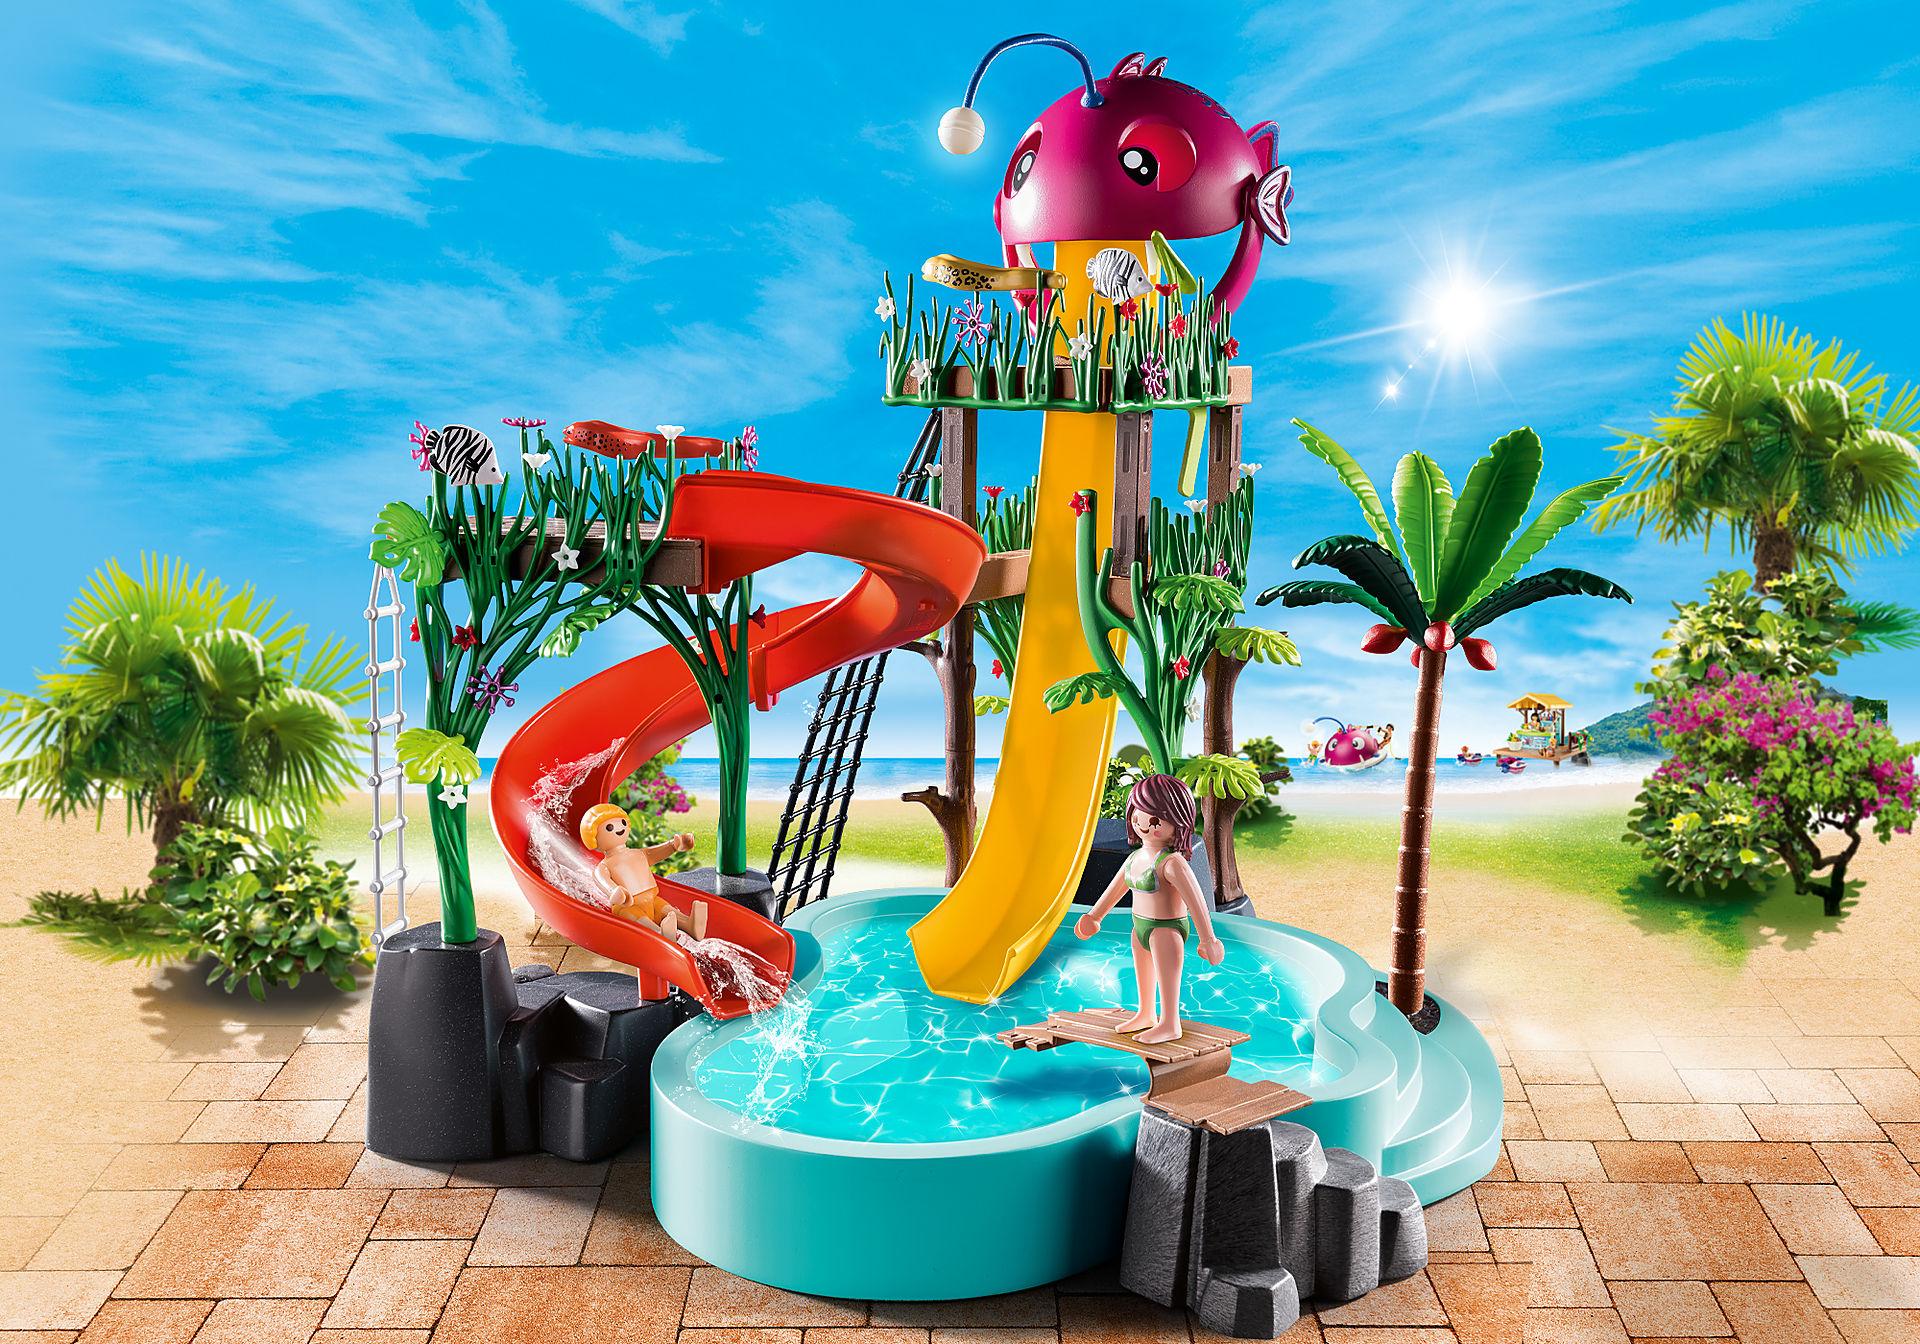 70609 Parc aquatique avec toboggans zoom image1